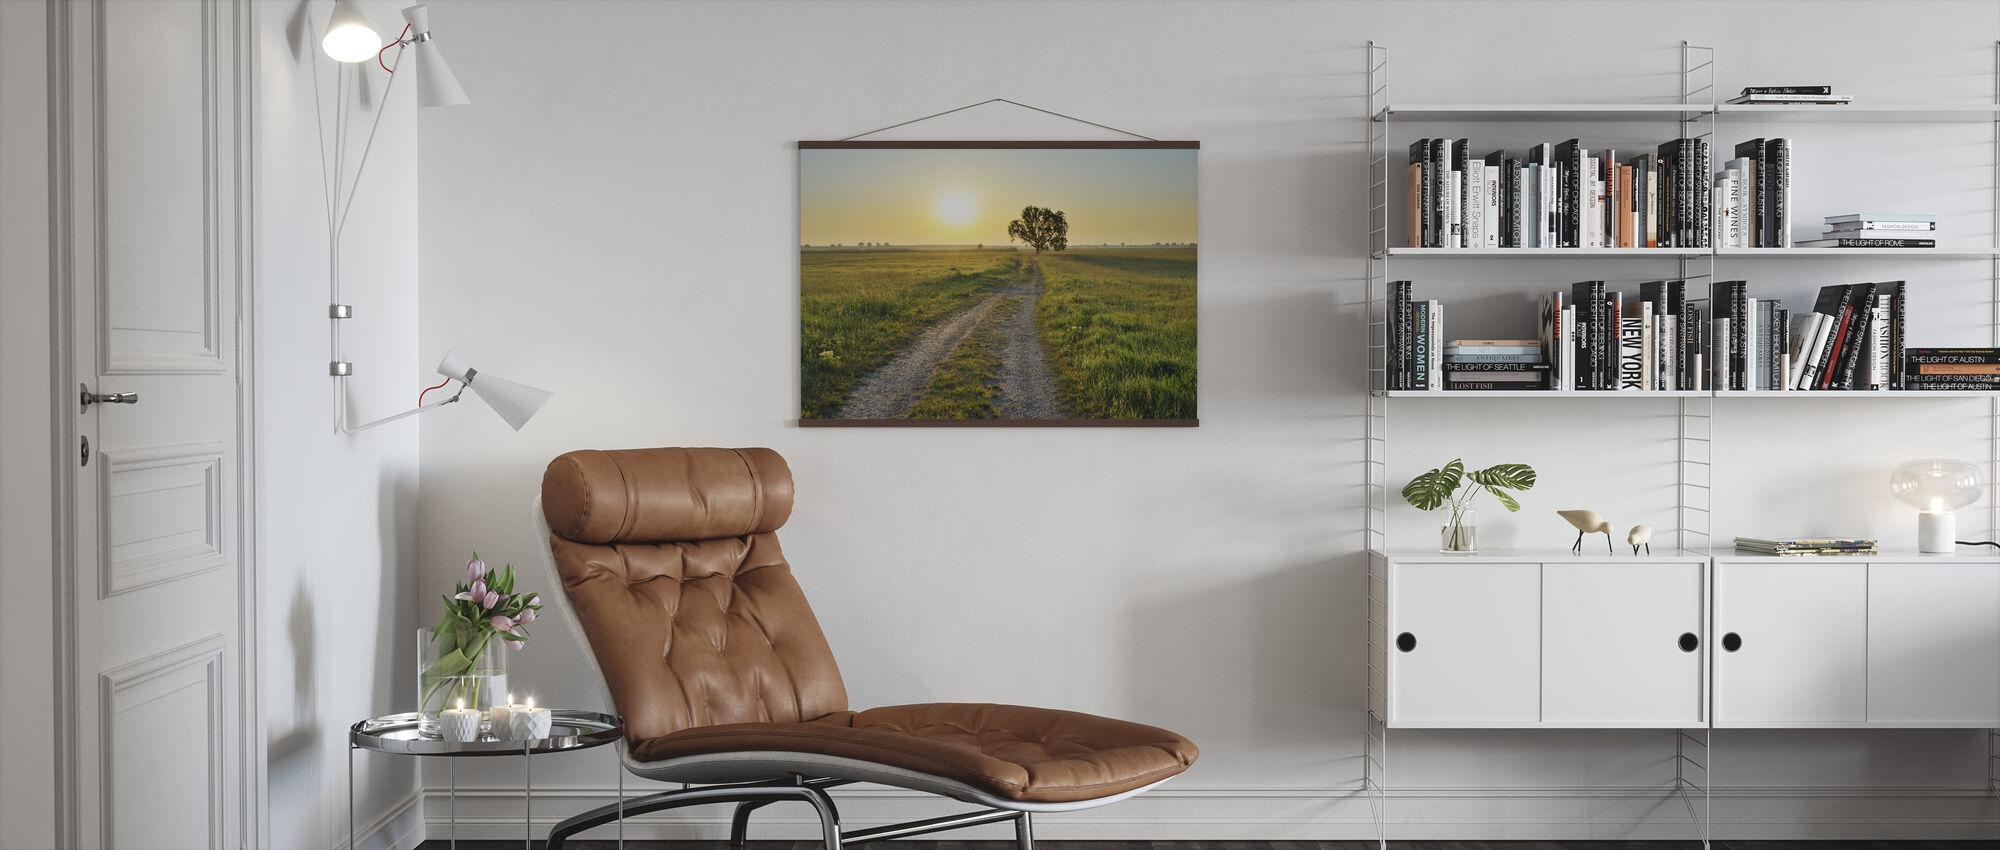 Inspiring Path - Poster - Living Room